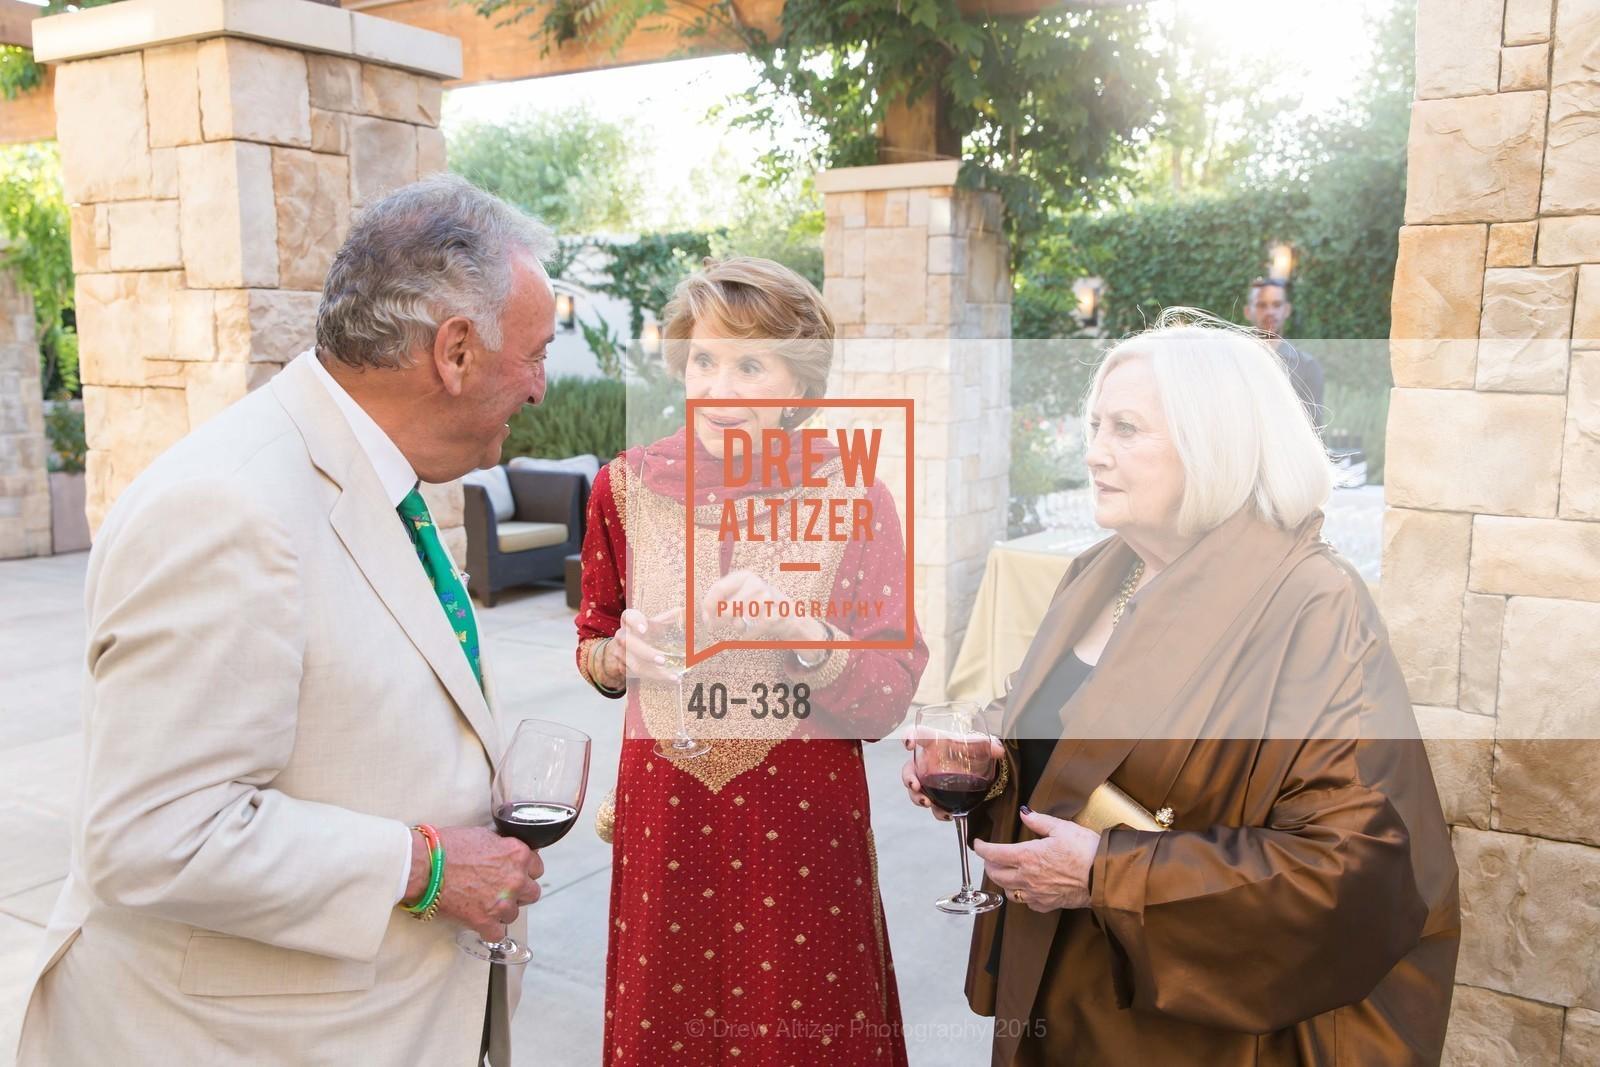 Sandy Weill, Joan Weill, Carmen Lasky, Photo #40-338